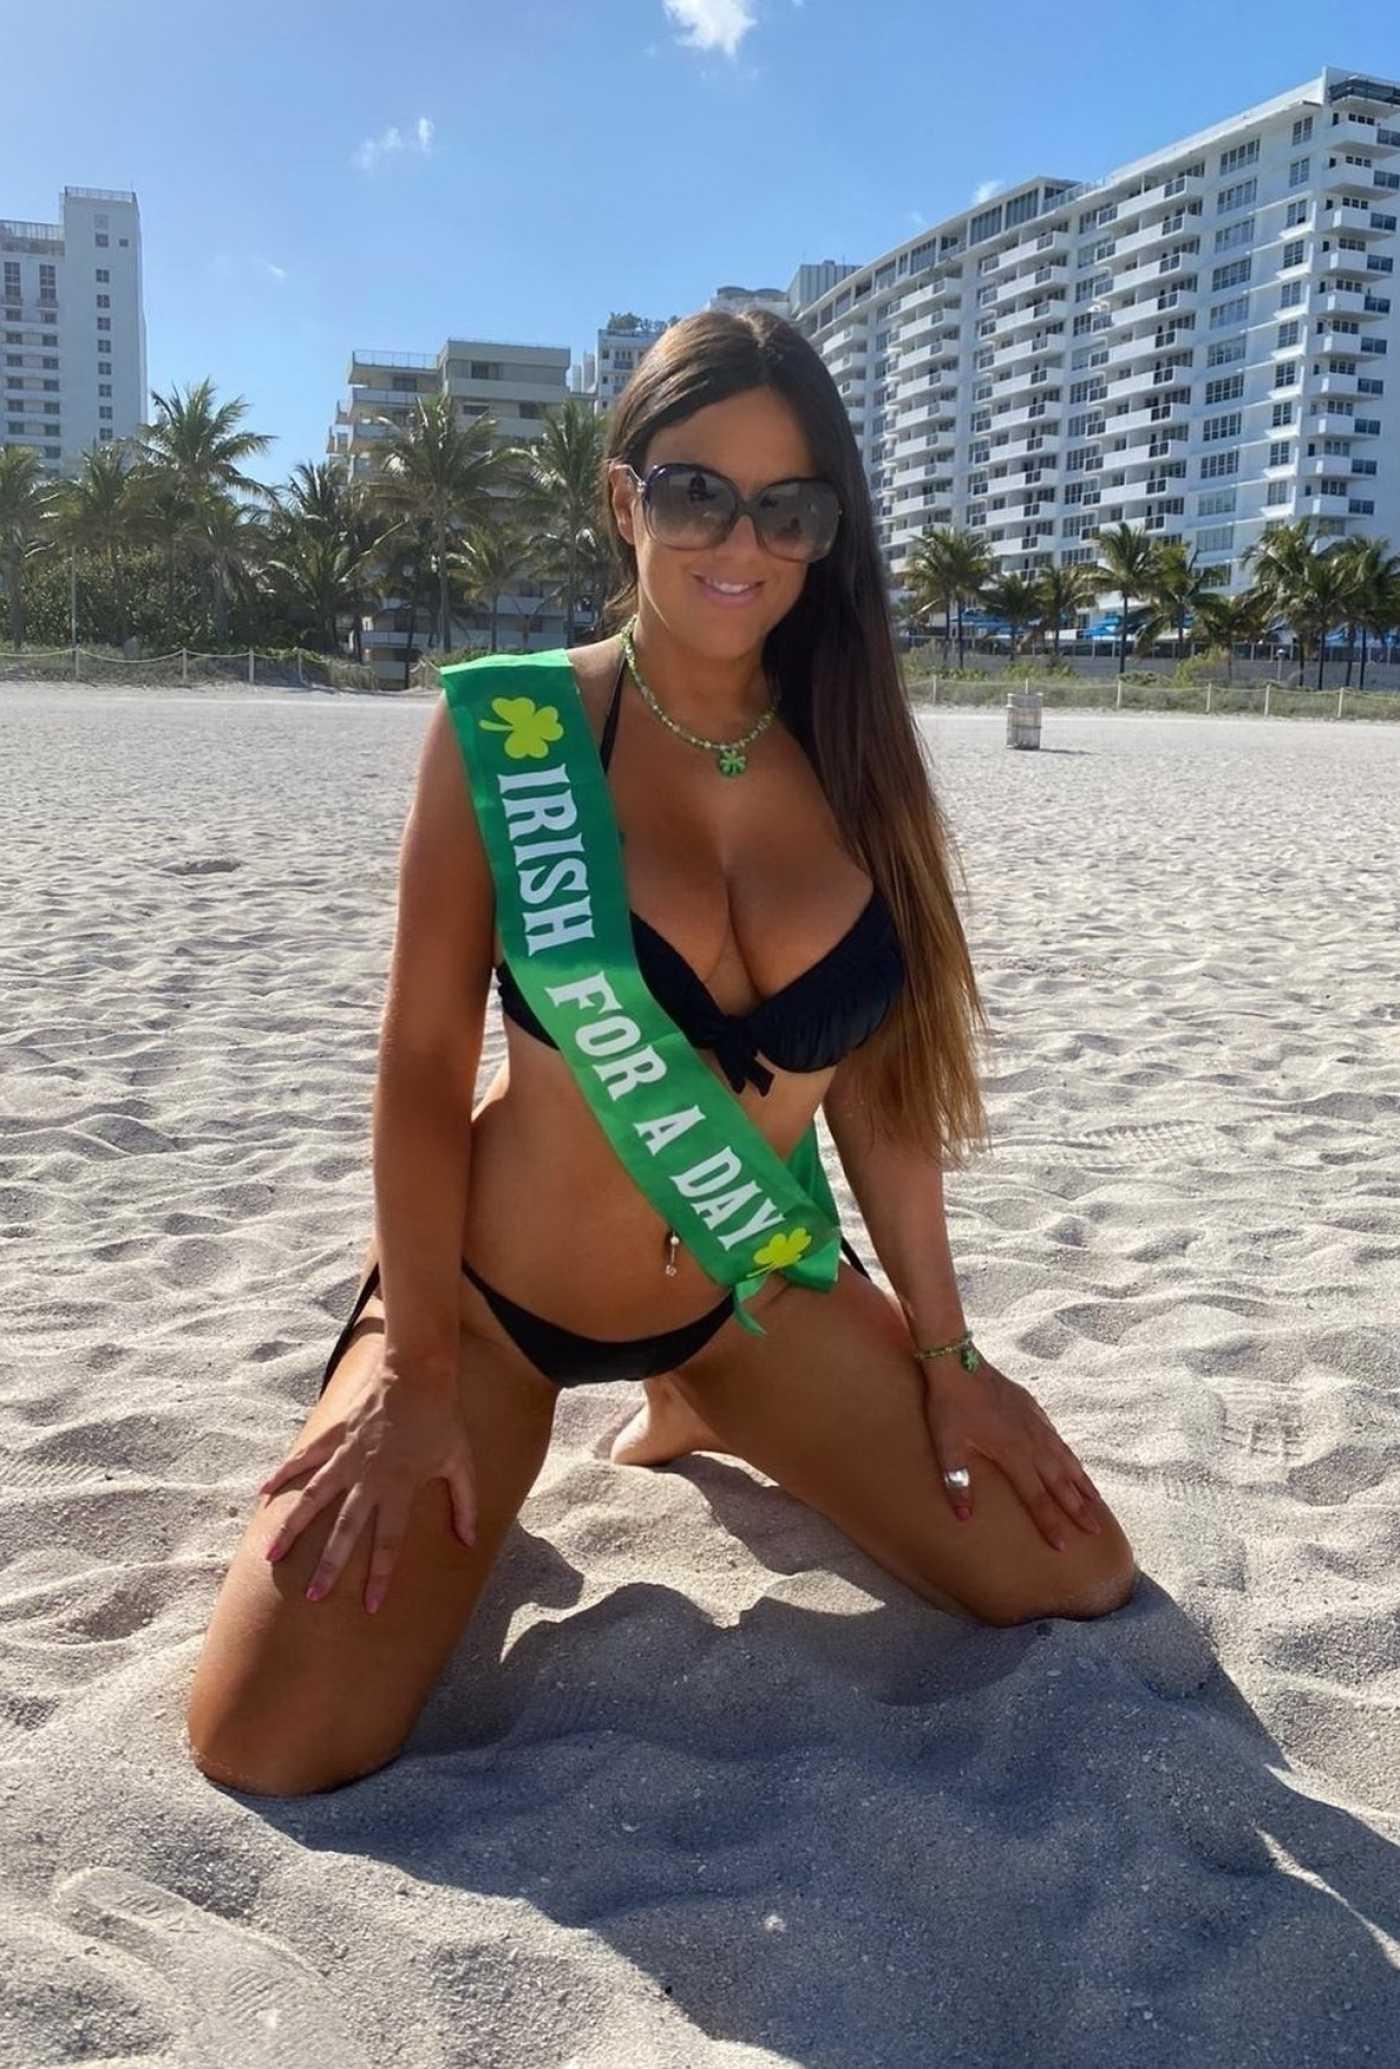 Claudia Romani in a Black Bikini on the Beach in Miami 03/16/2020